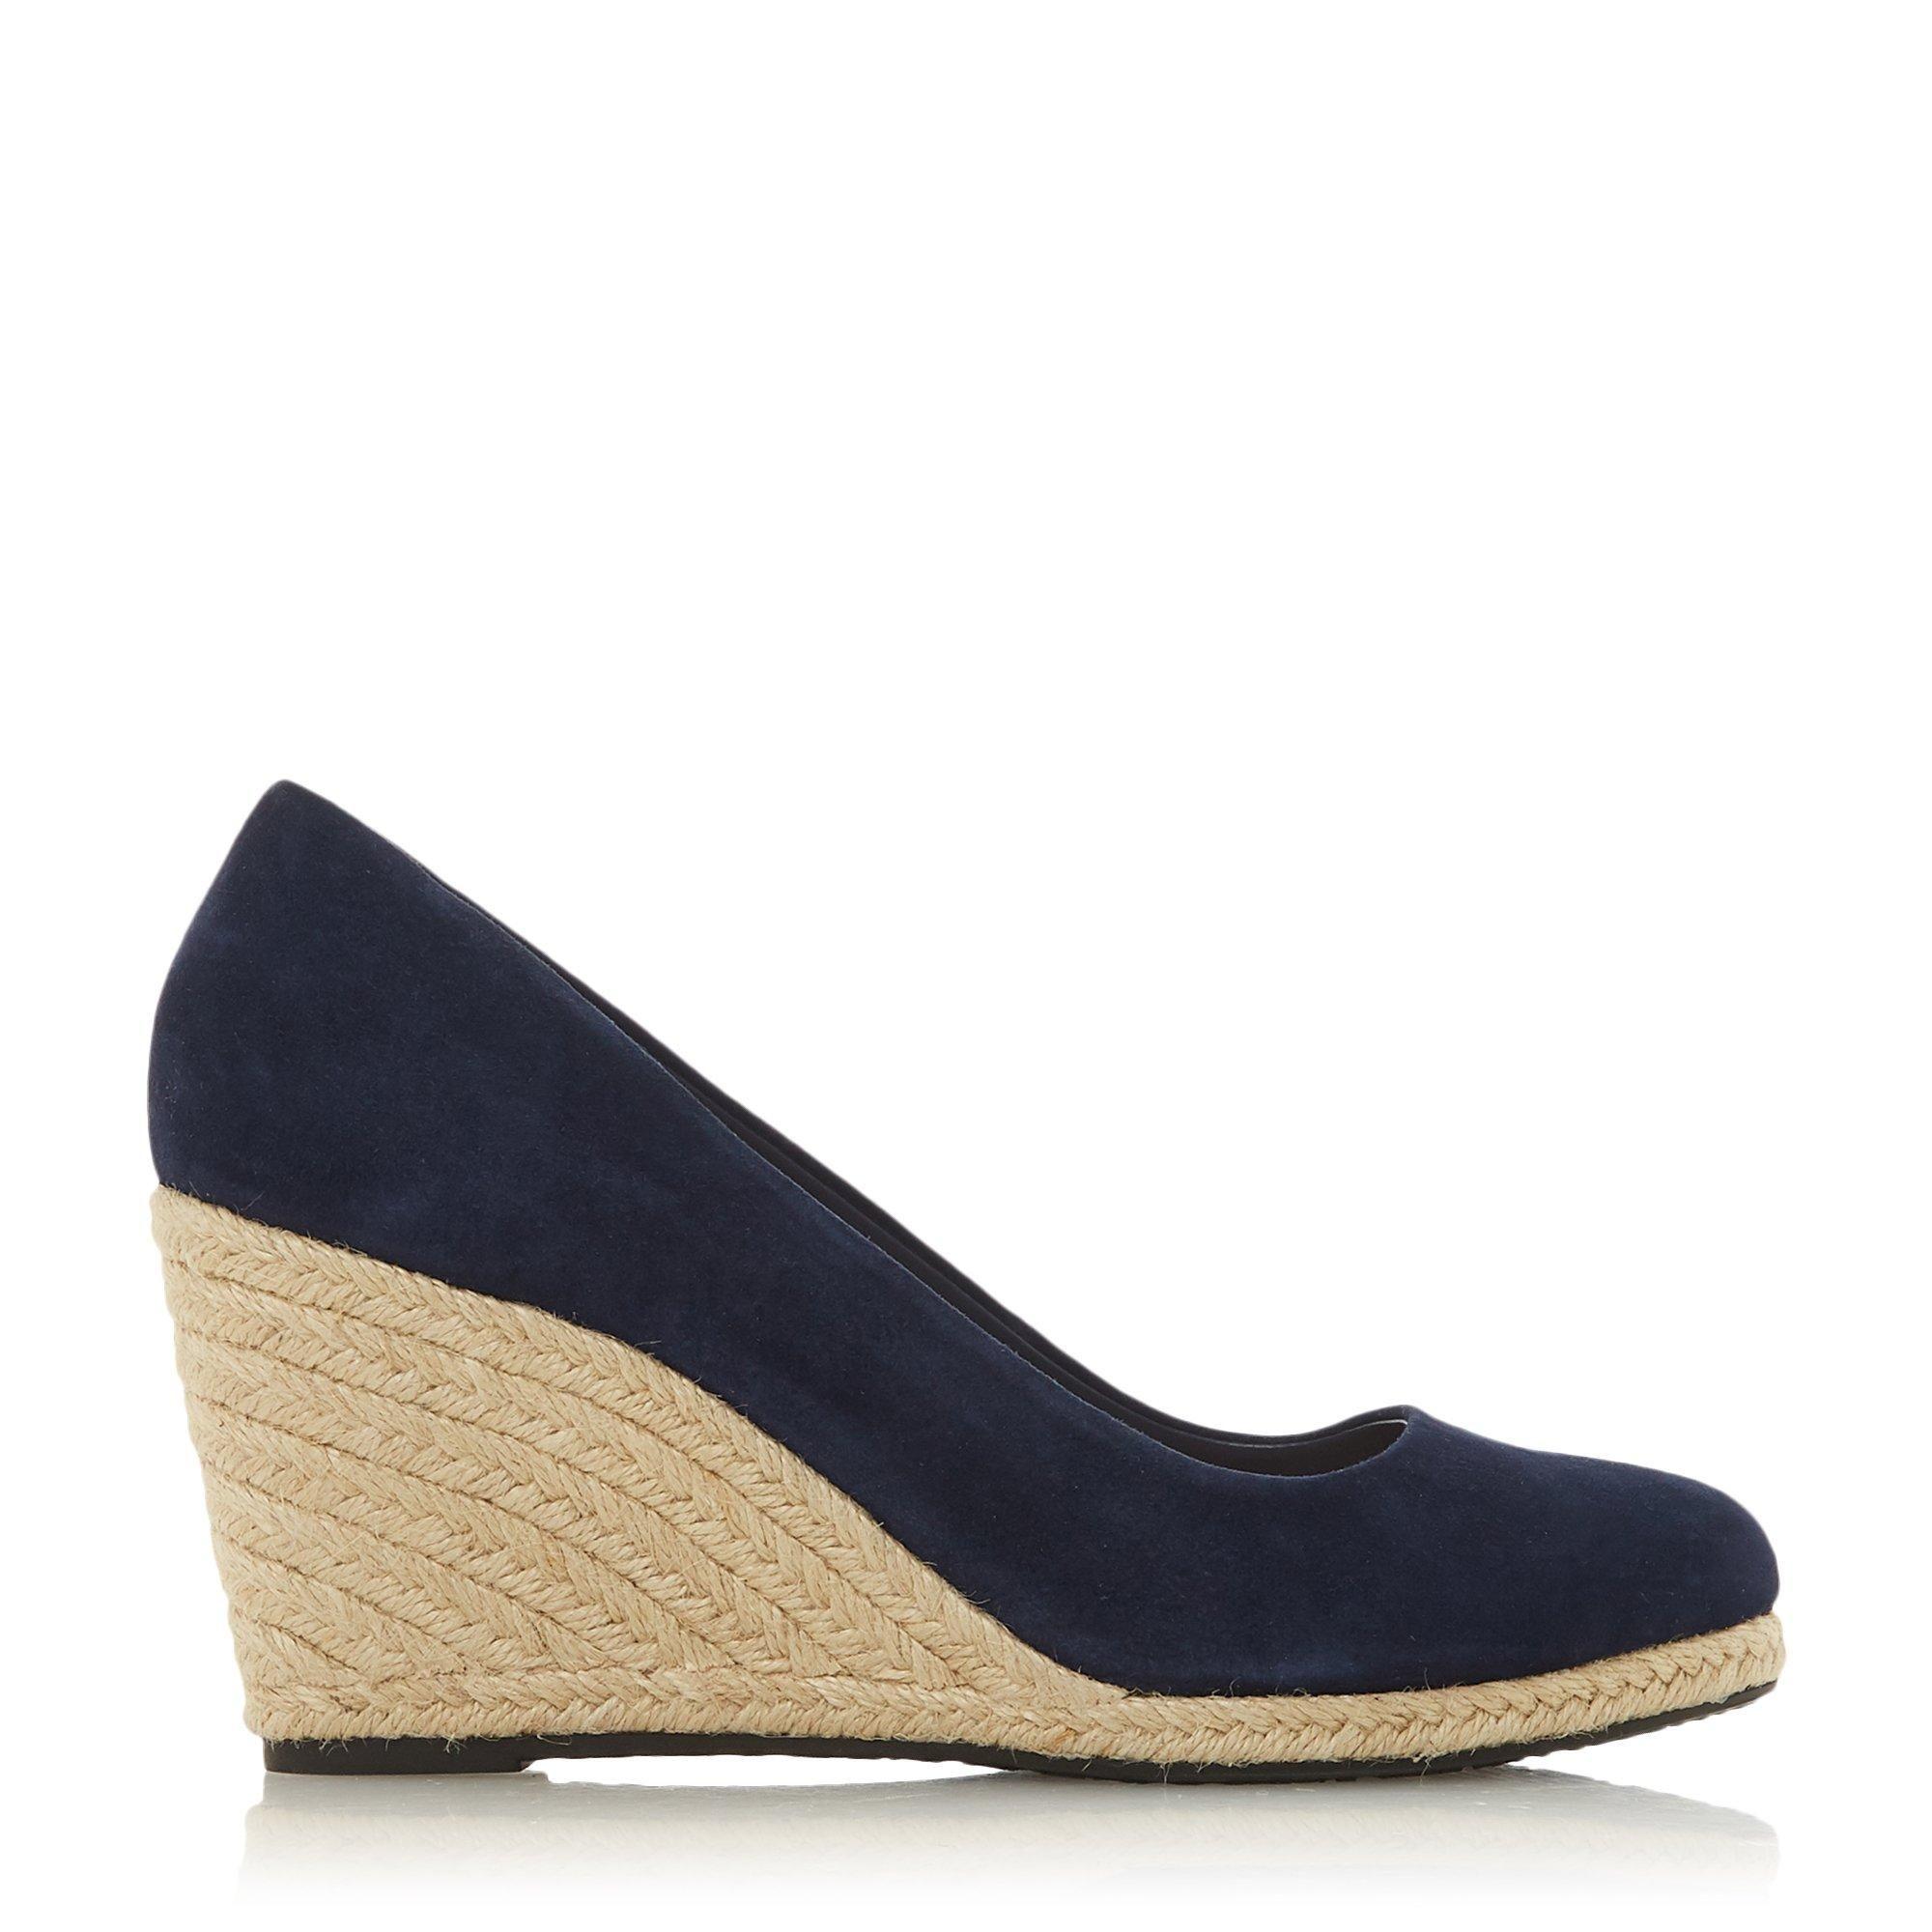 Dune Ladies ANNABELLA Heeled Espadrille Wedge Shoes